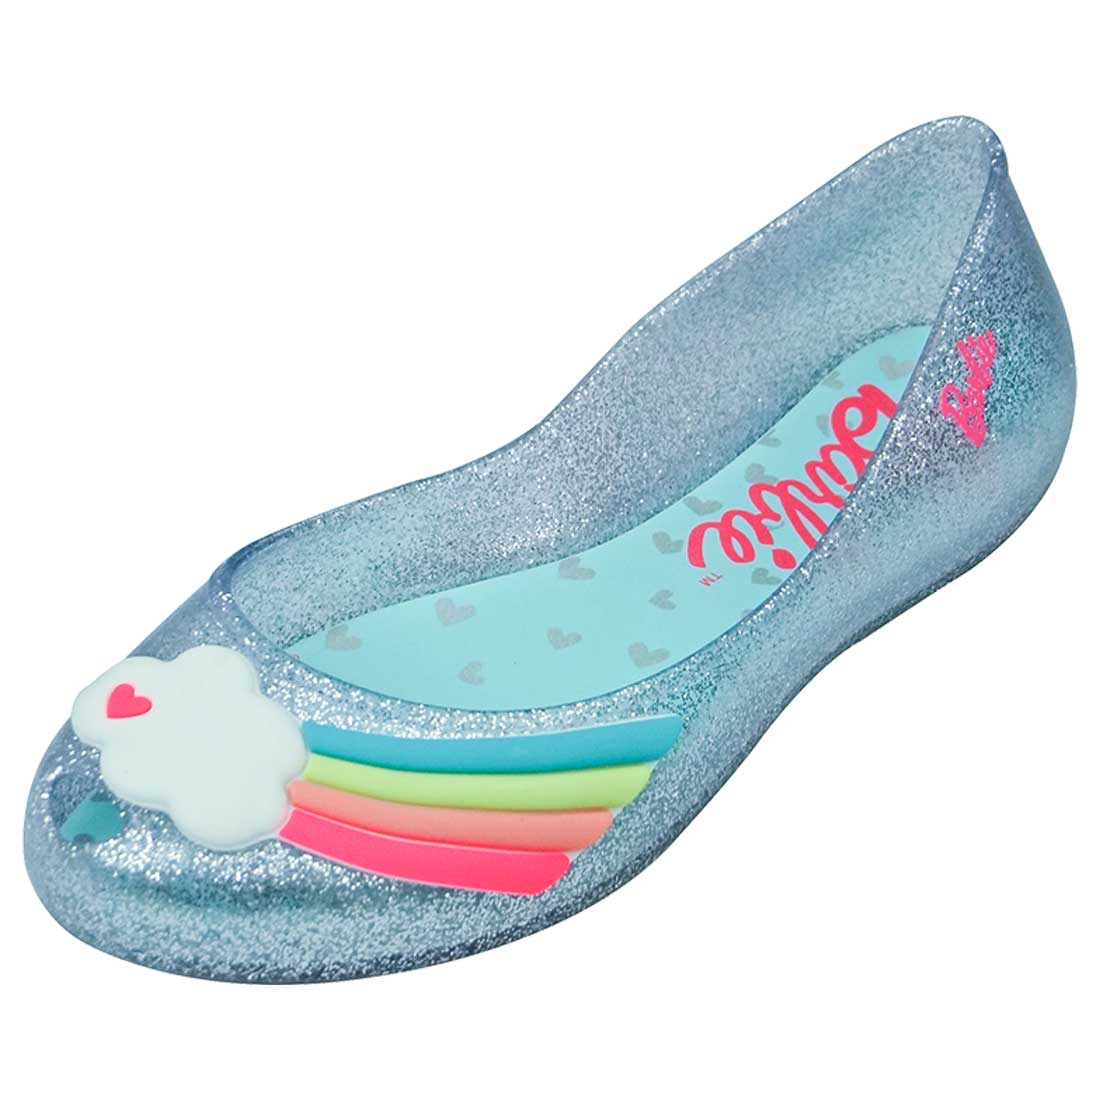 Sapatilha Infantil Glitter Barbie  - Prata